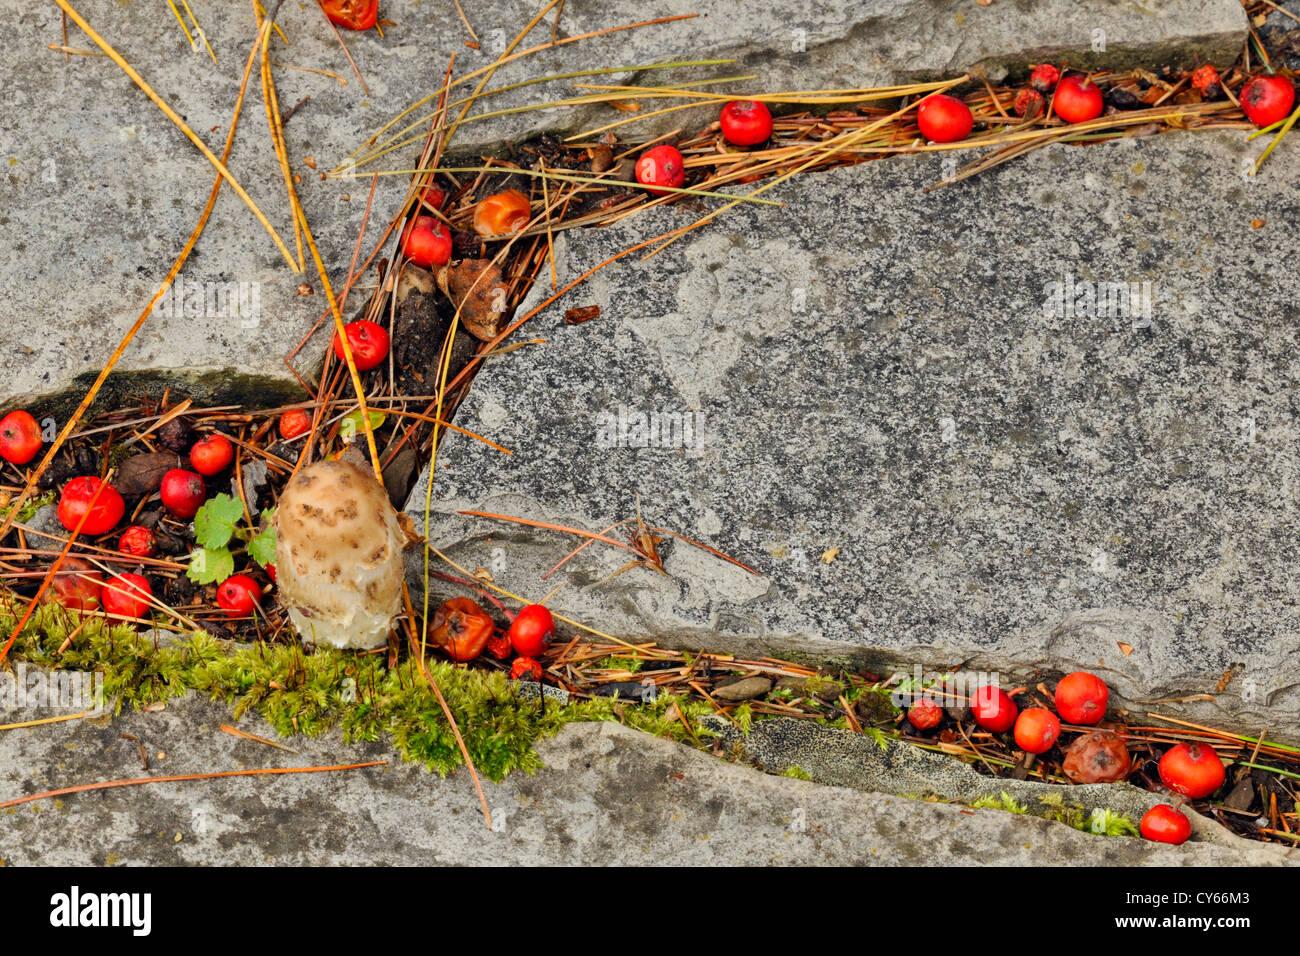 Fallen Mountain Ash Berries Collected On Patio Stones, Greater Sudbury,  Ontario, Canada